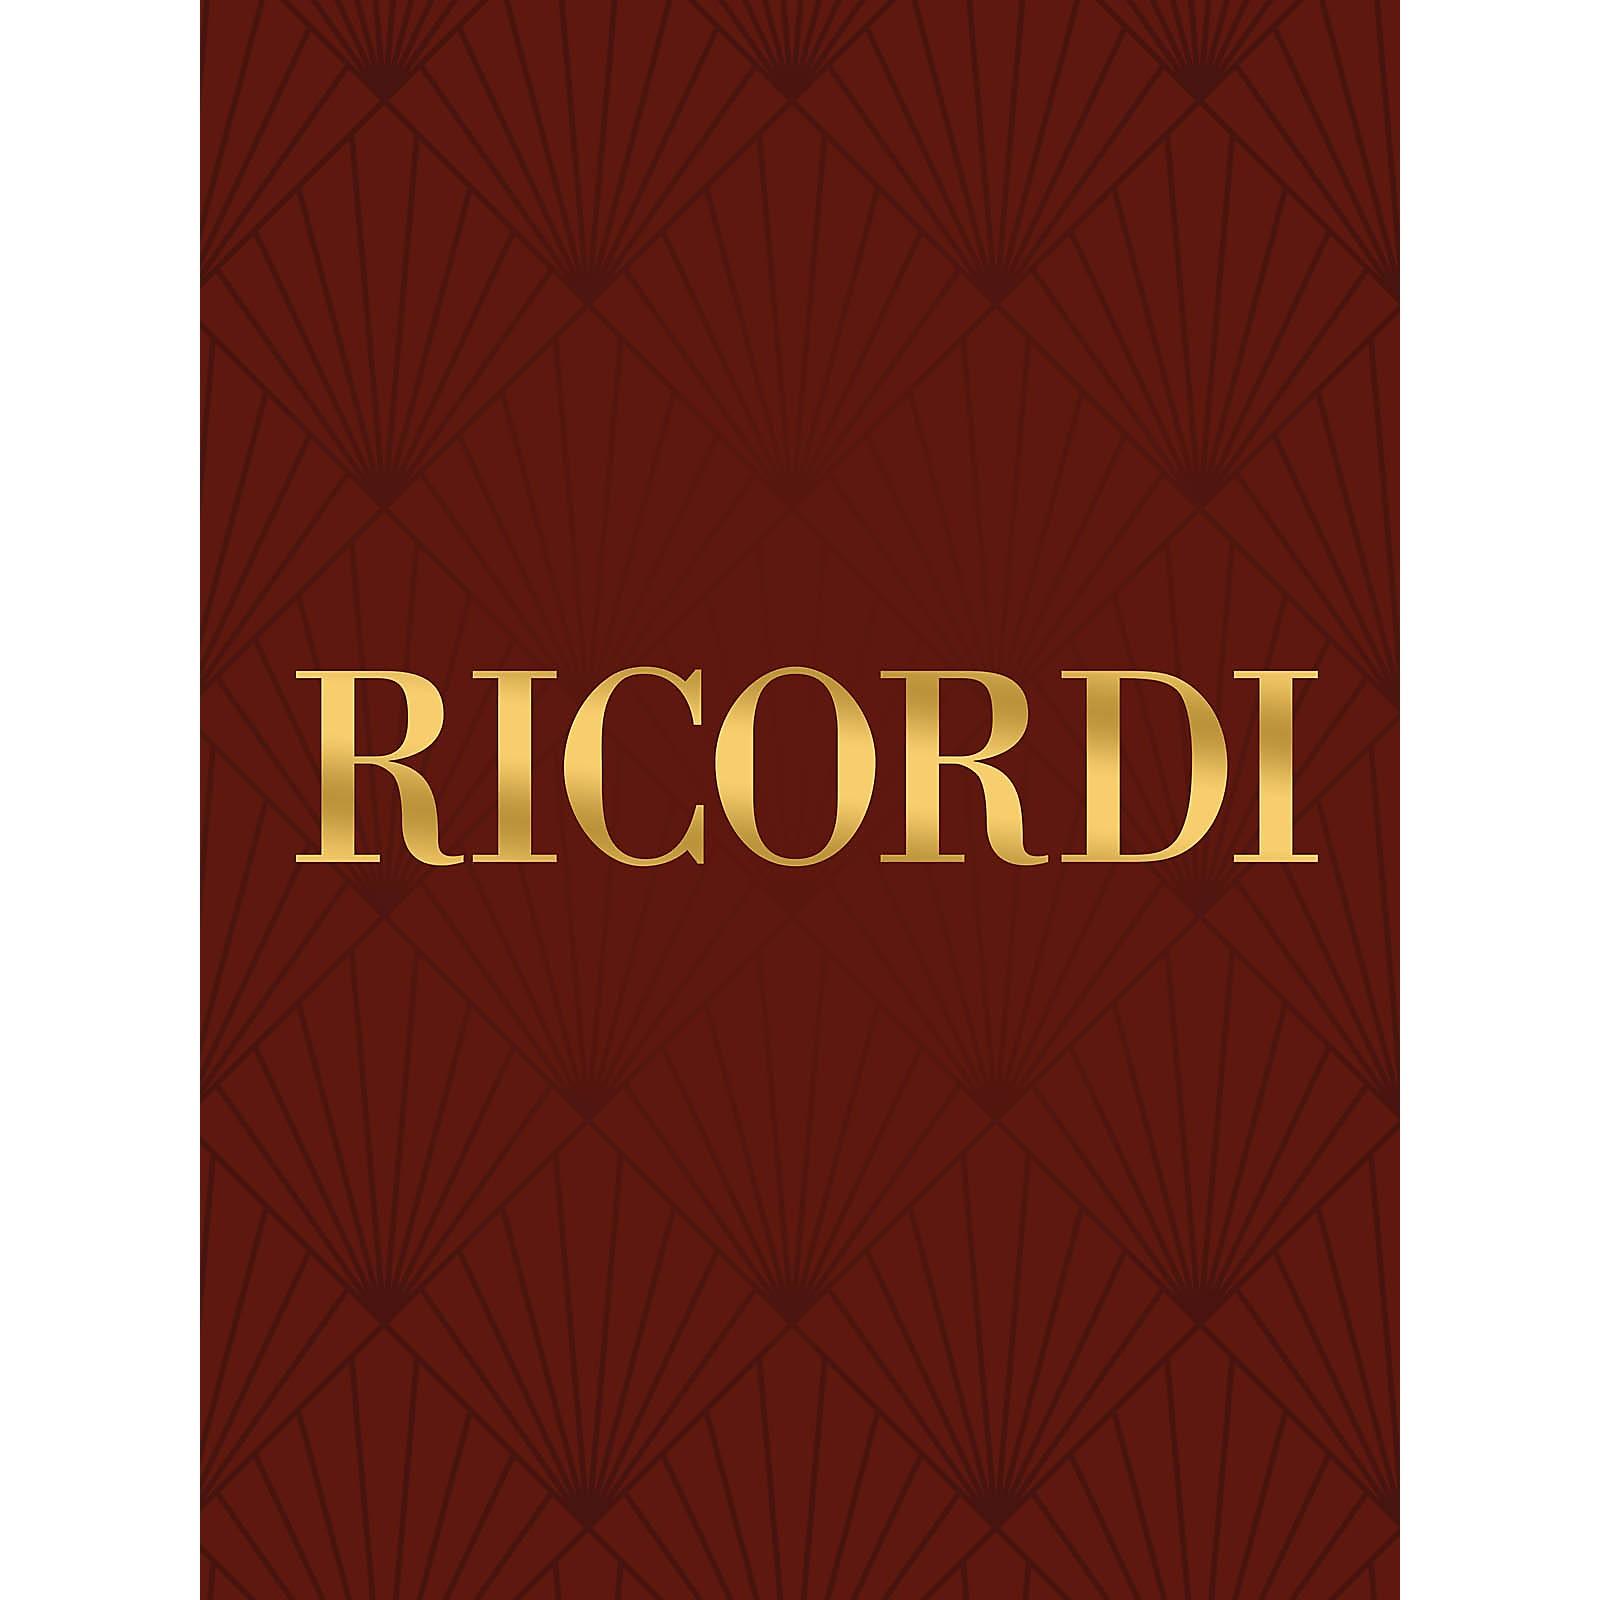 Ricordi 6 Concert Duets Vol. 2 (Nos. 4-6) (2 clarinets) Woodwind Ensemble Series Edited by Giuseppe Garbarino